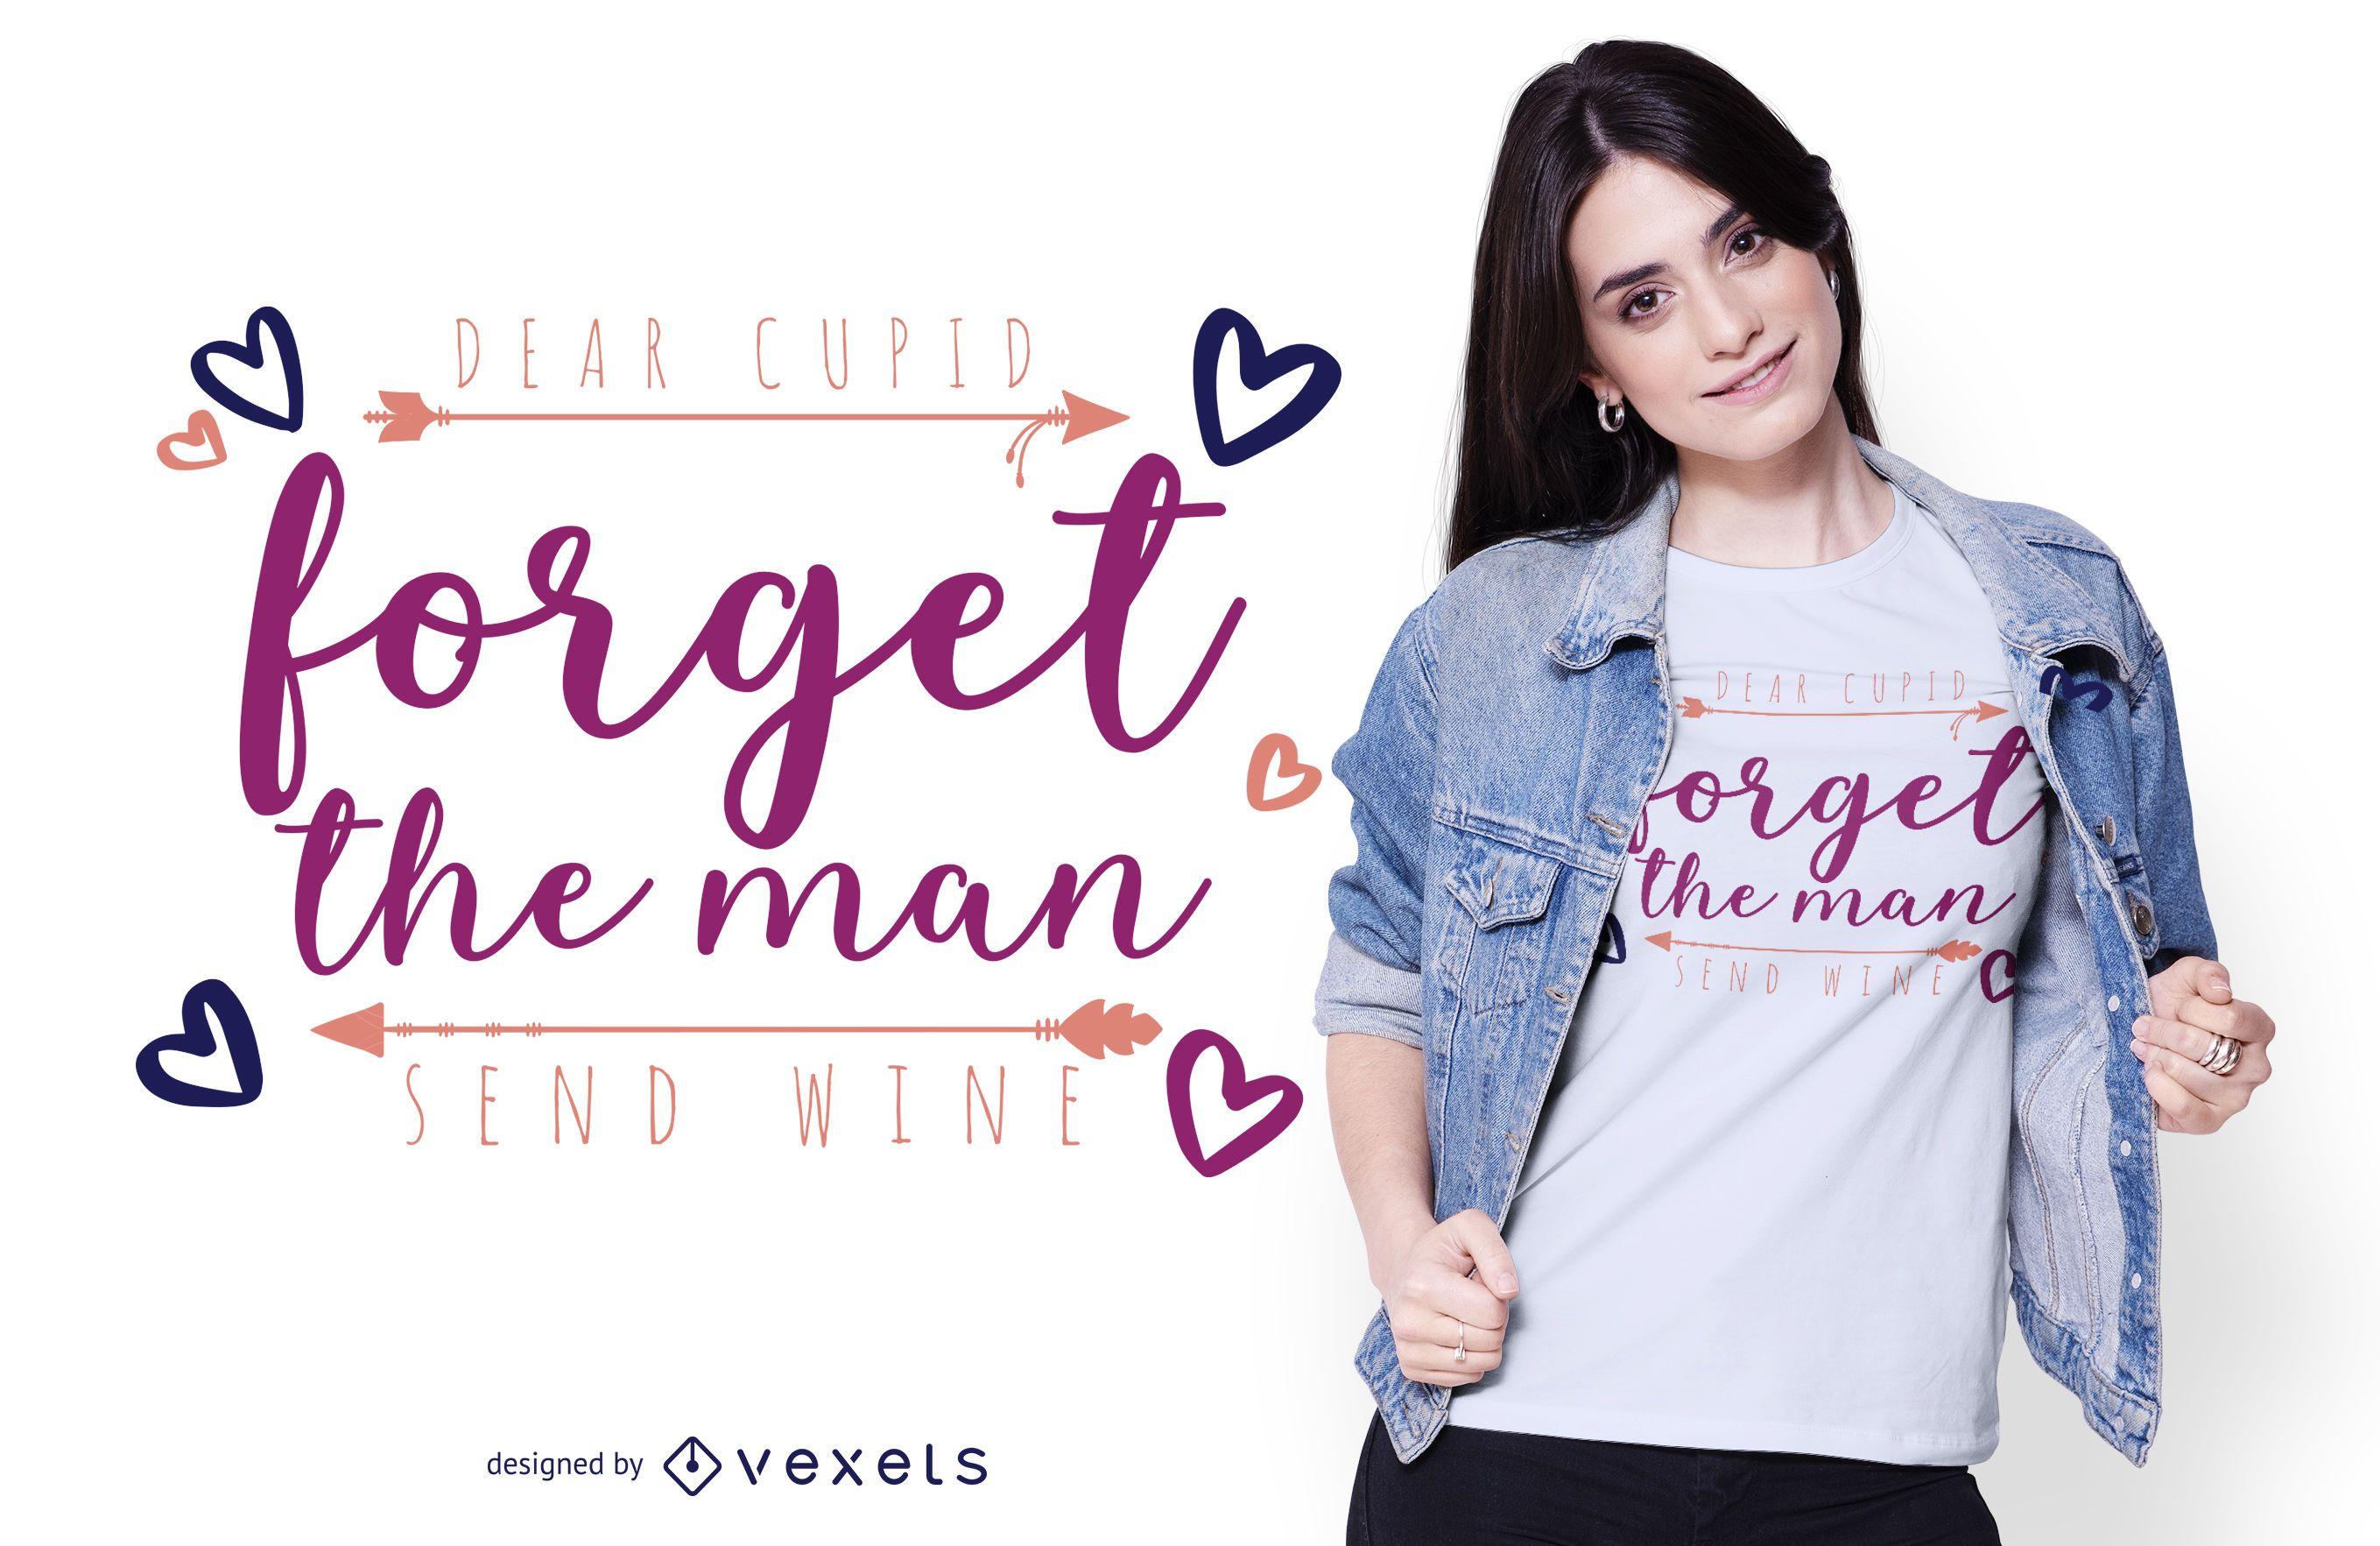 Dear cupid t-shirt design